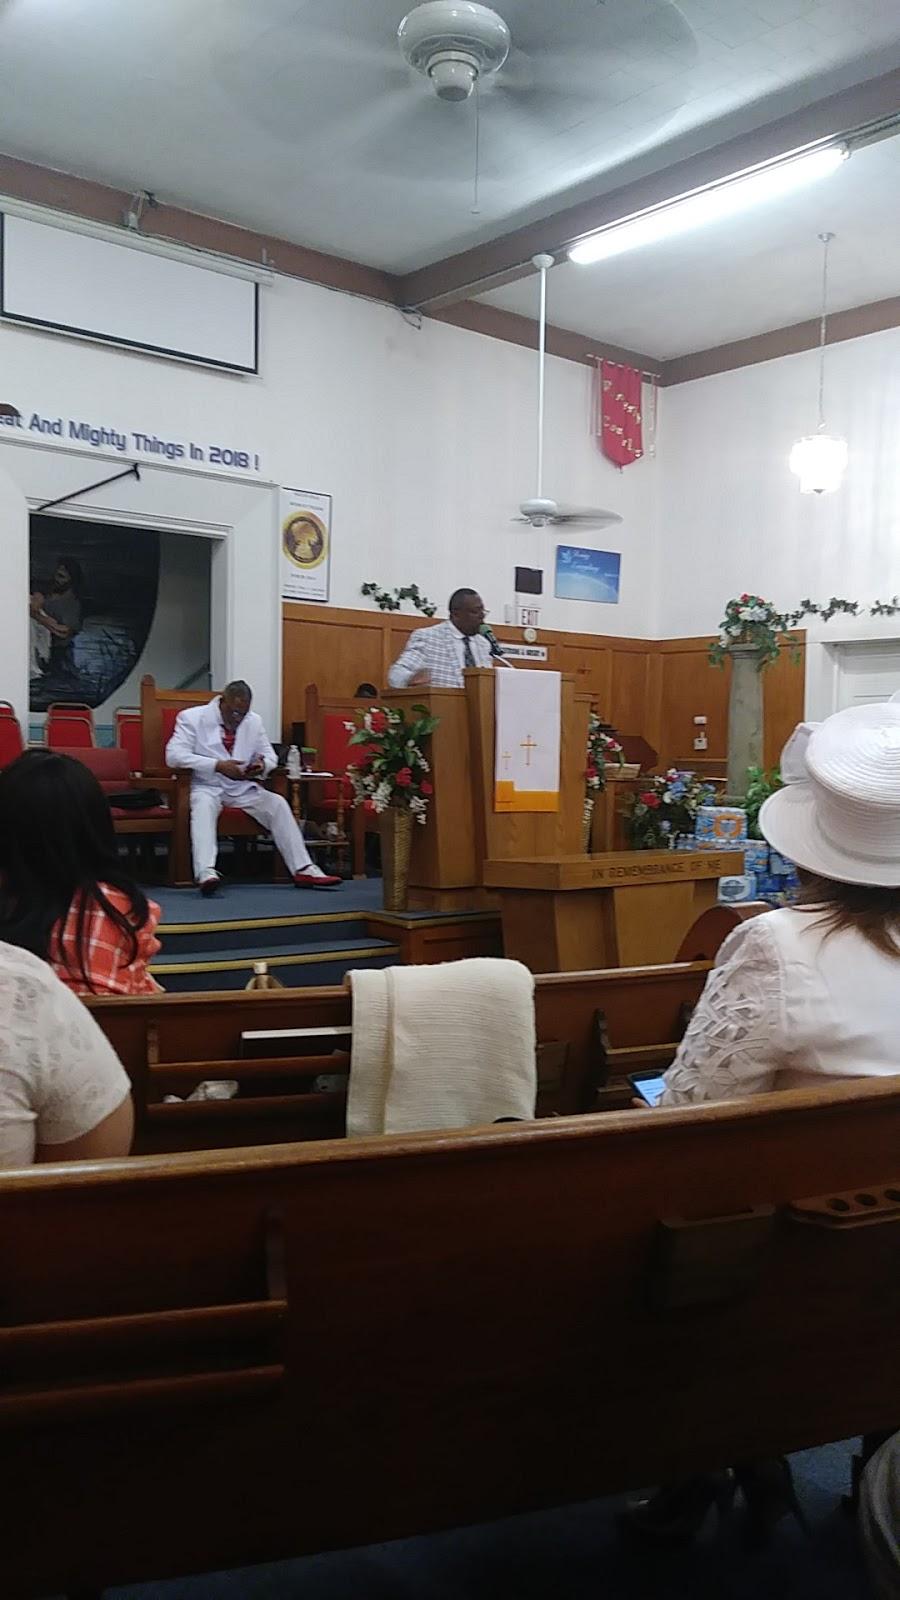 Shiloh Church of God in Christ - church  | Photo 1 of 4 | Address: 1707 Harrison St, Melissa, TX 75454, USA | Phone: (972) 838-9377